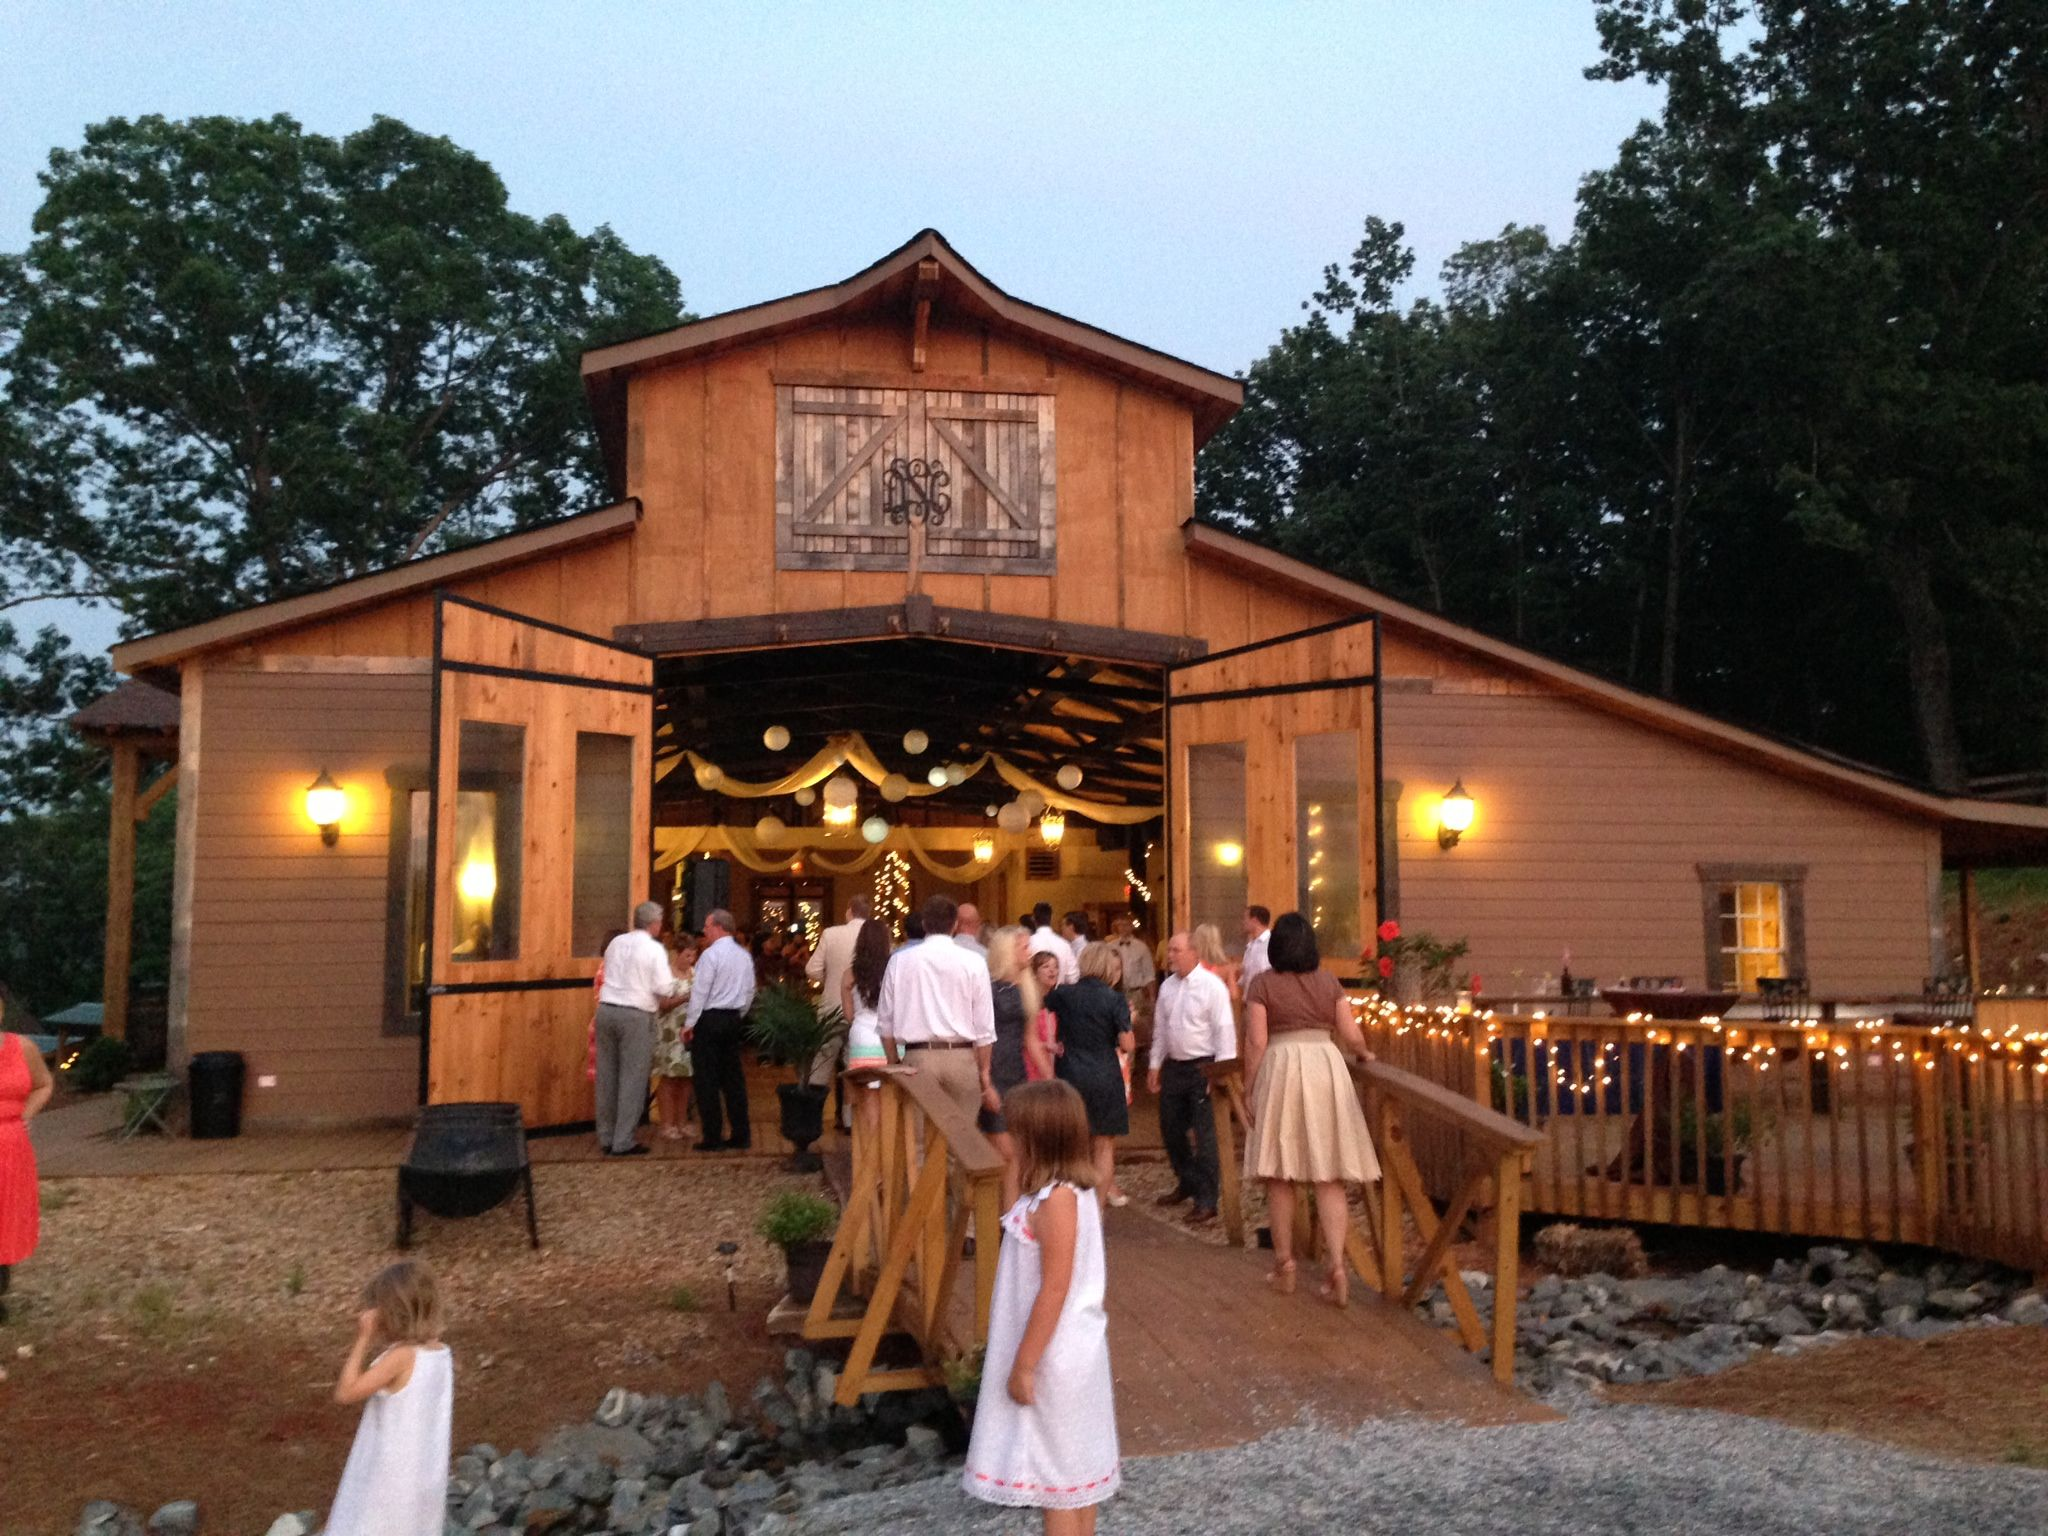 White Oaks Barn Reception Dahlonega GA | Wedding And Barn Reception - White Oaks Dahlonega ...